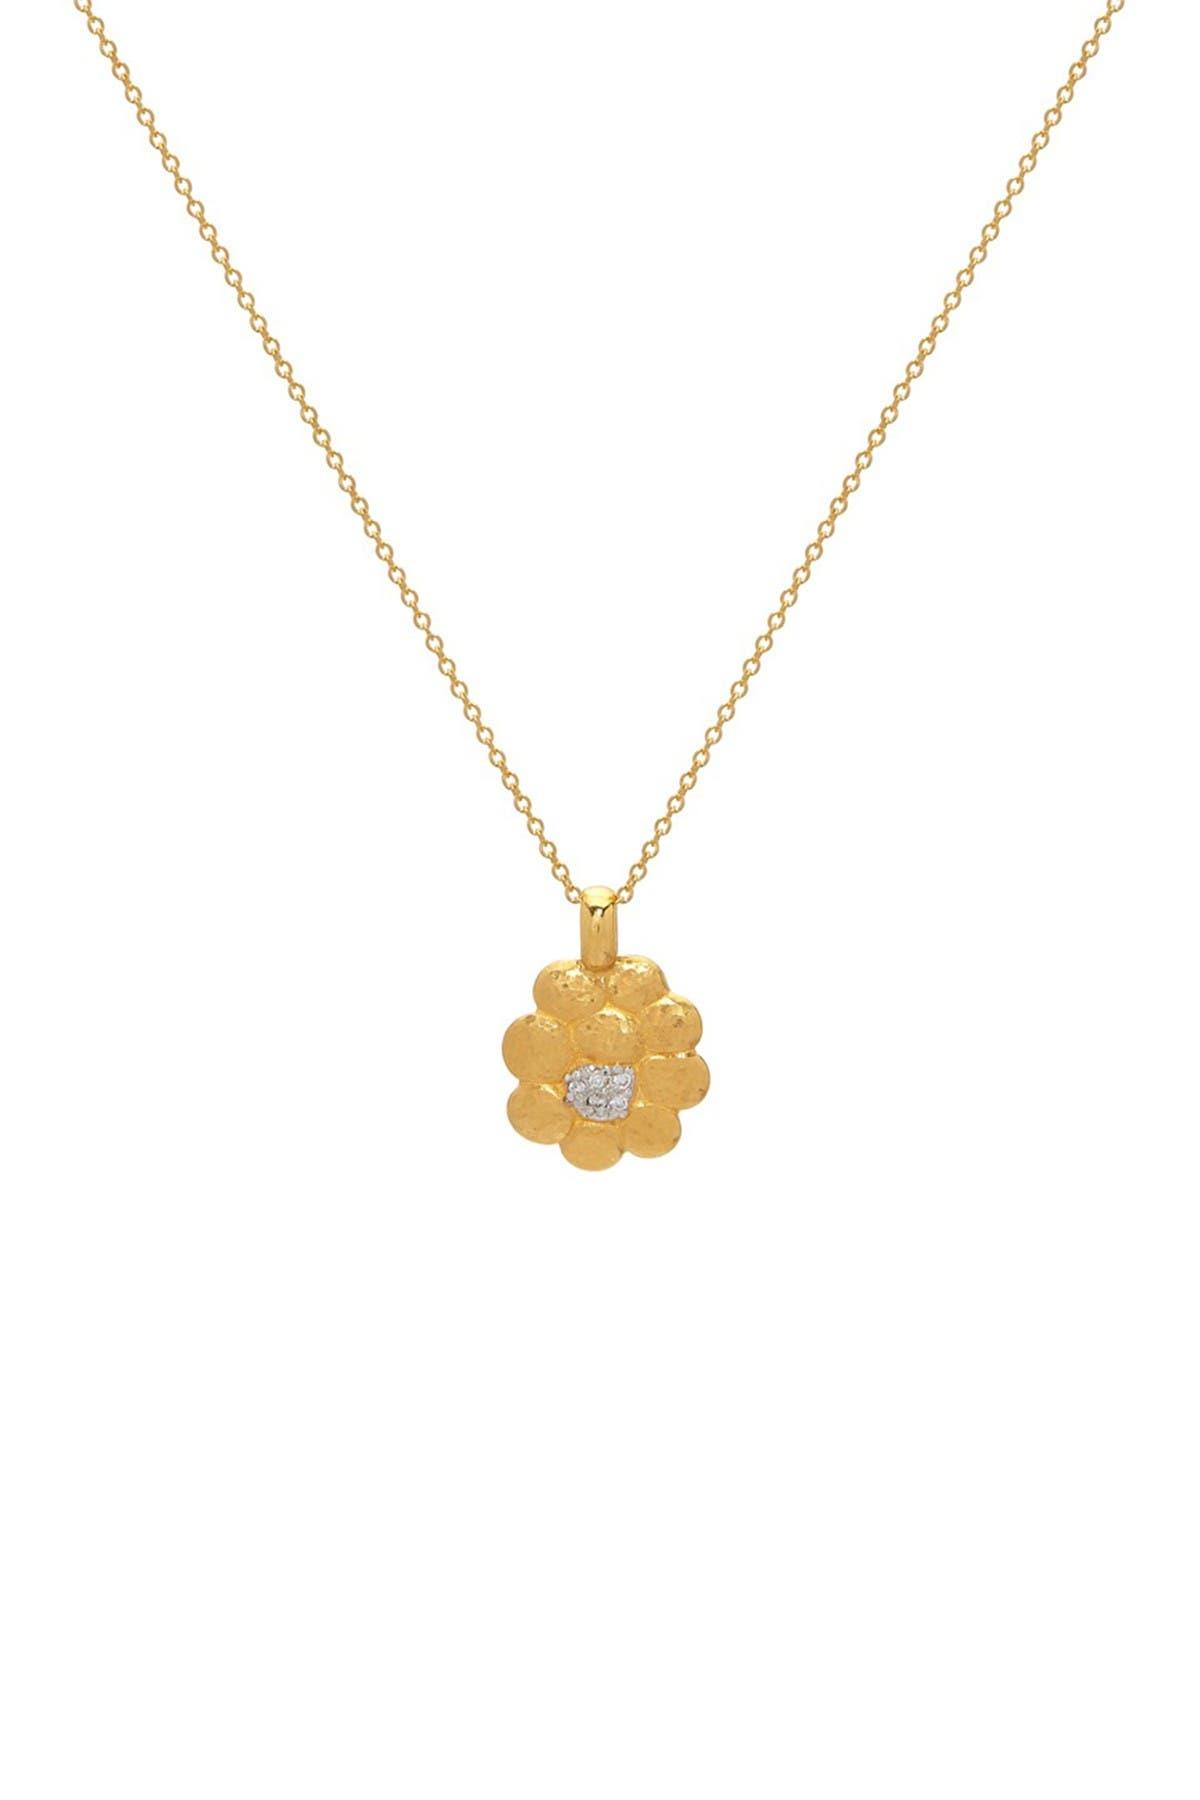 Image of Gurhan 22K Gold Pebble Diamond Pendant Necklace - 0.035 ctw